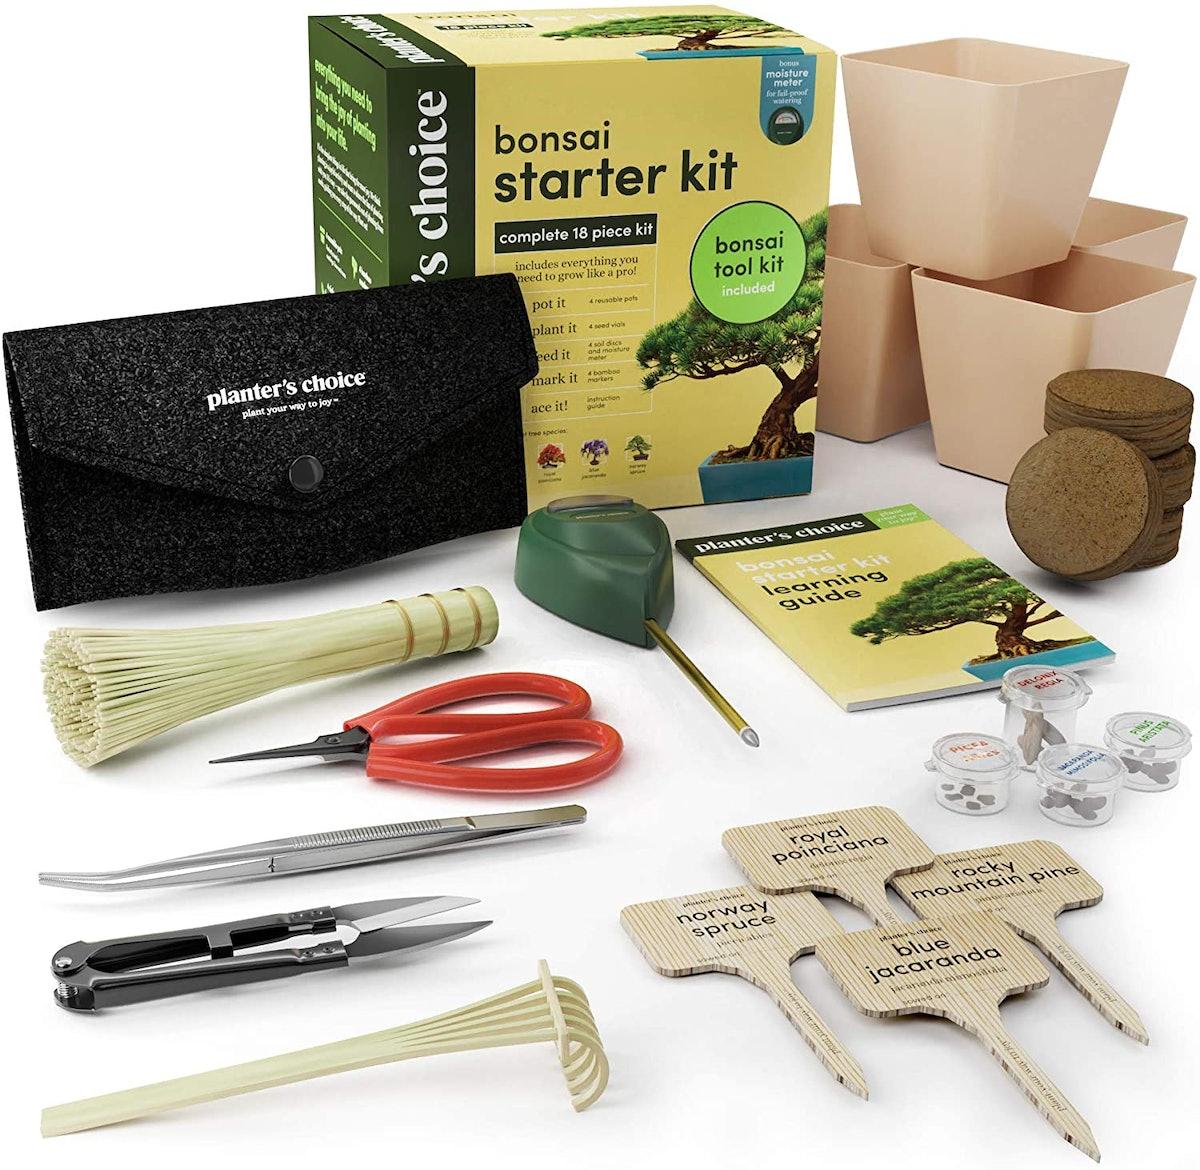 Planter's Choice Bonsai Starter Kit